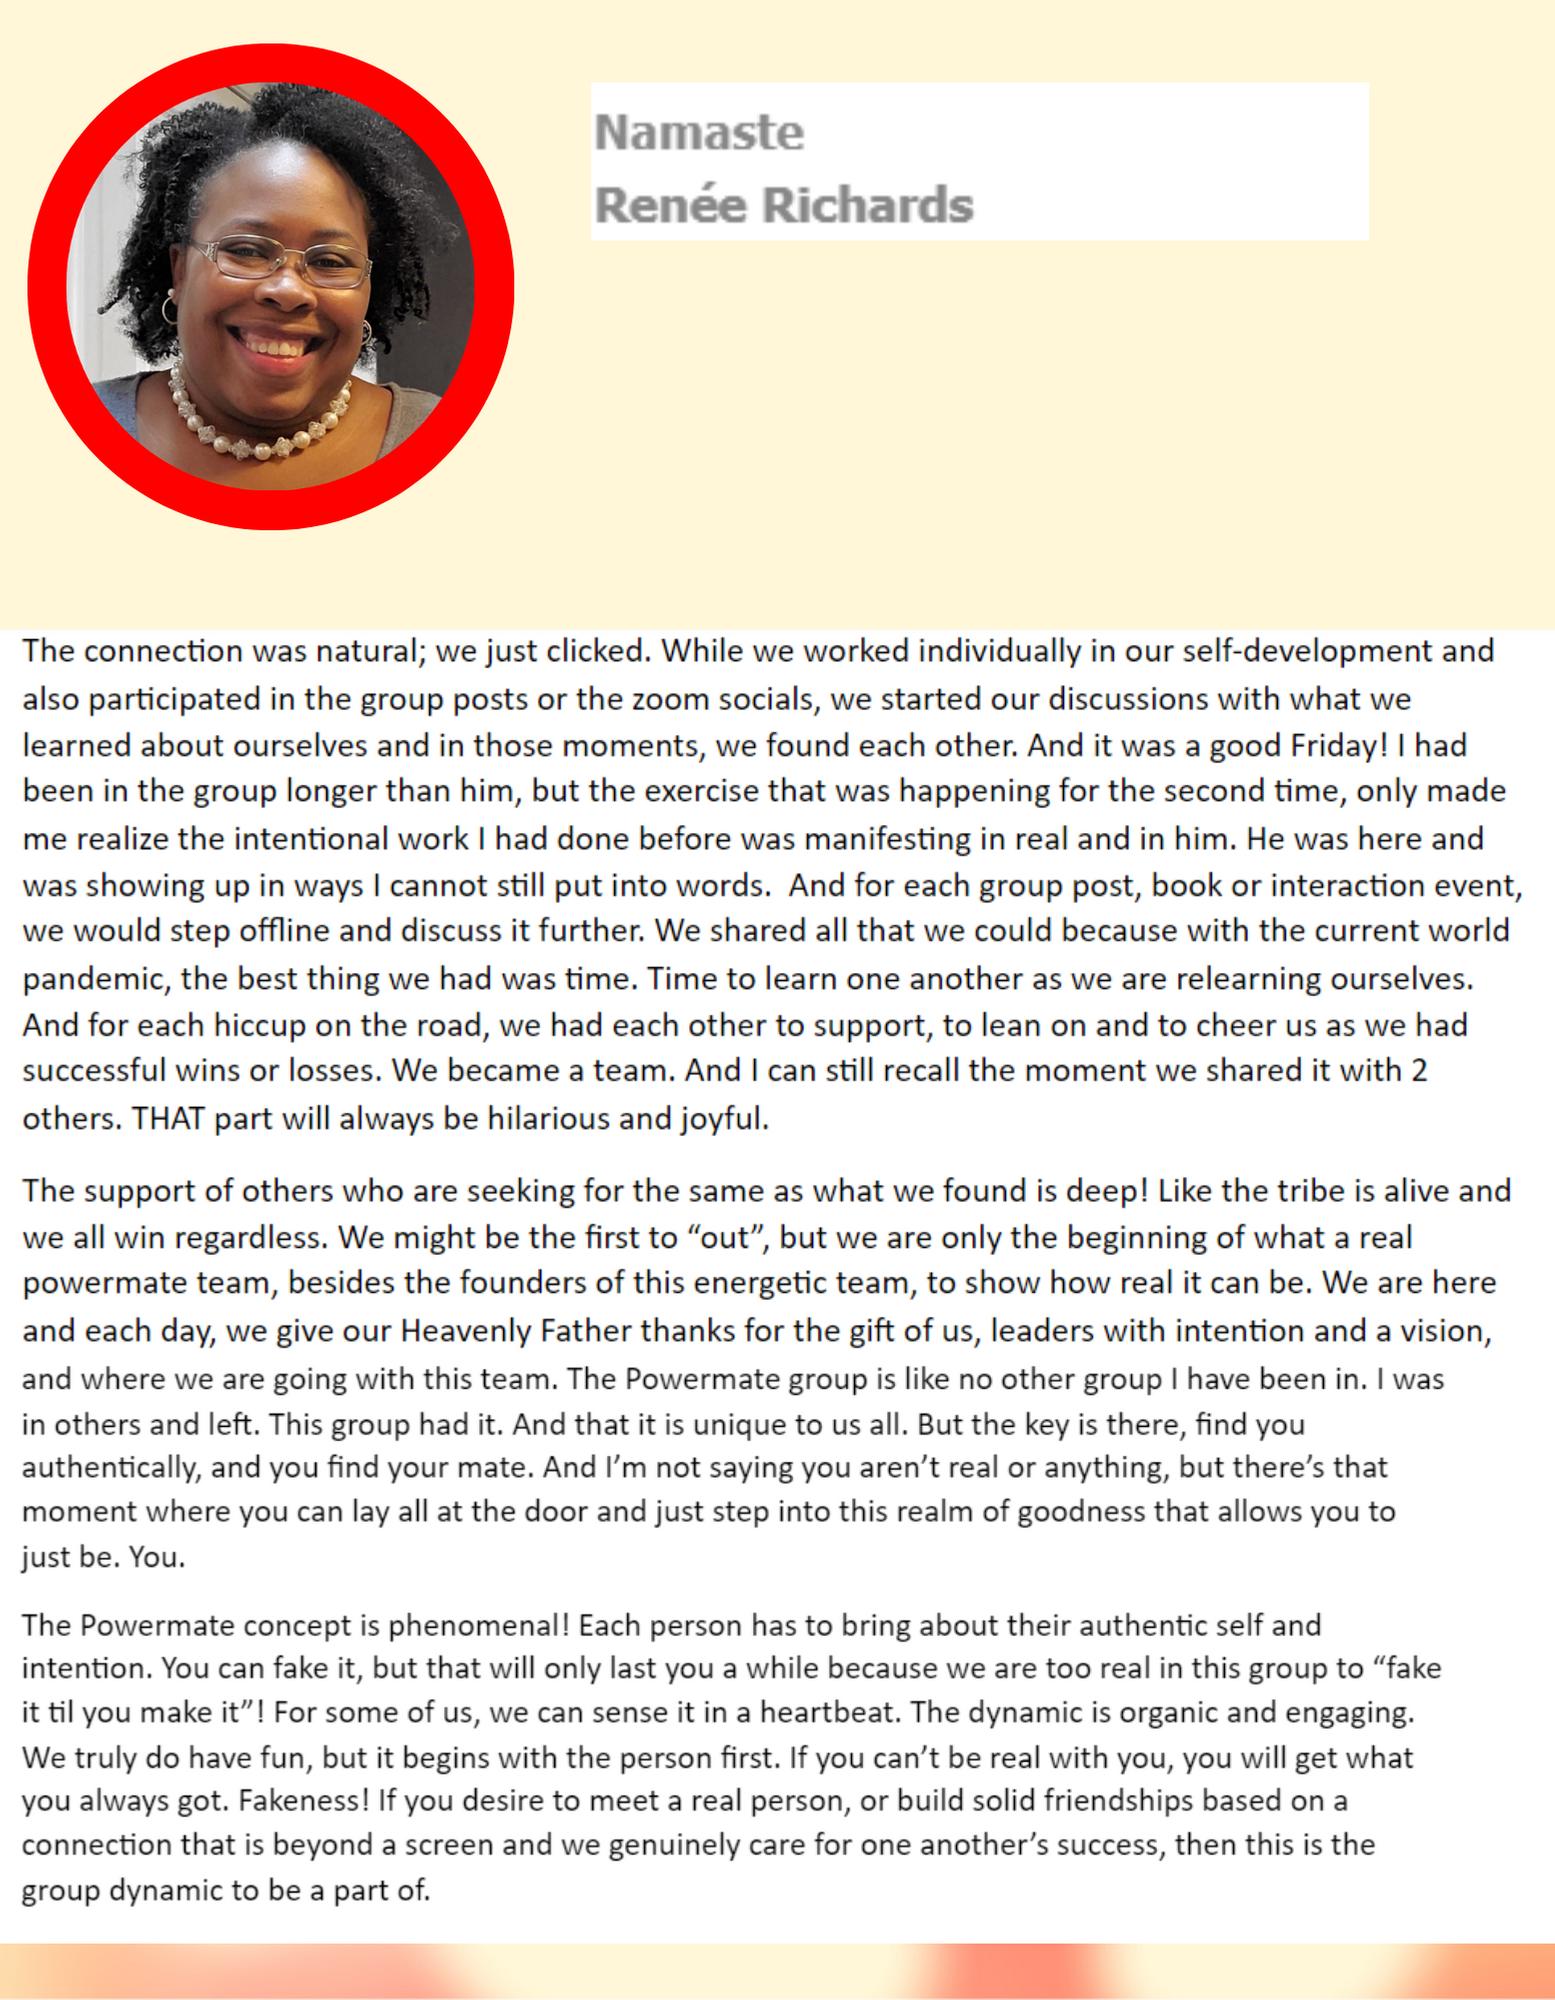 Renee's amazing testimonial